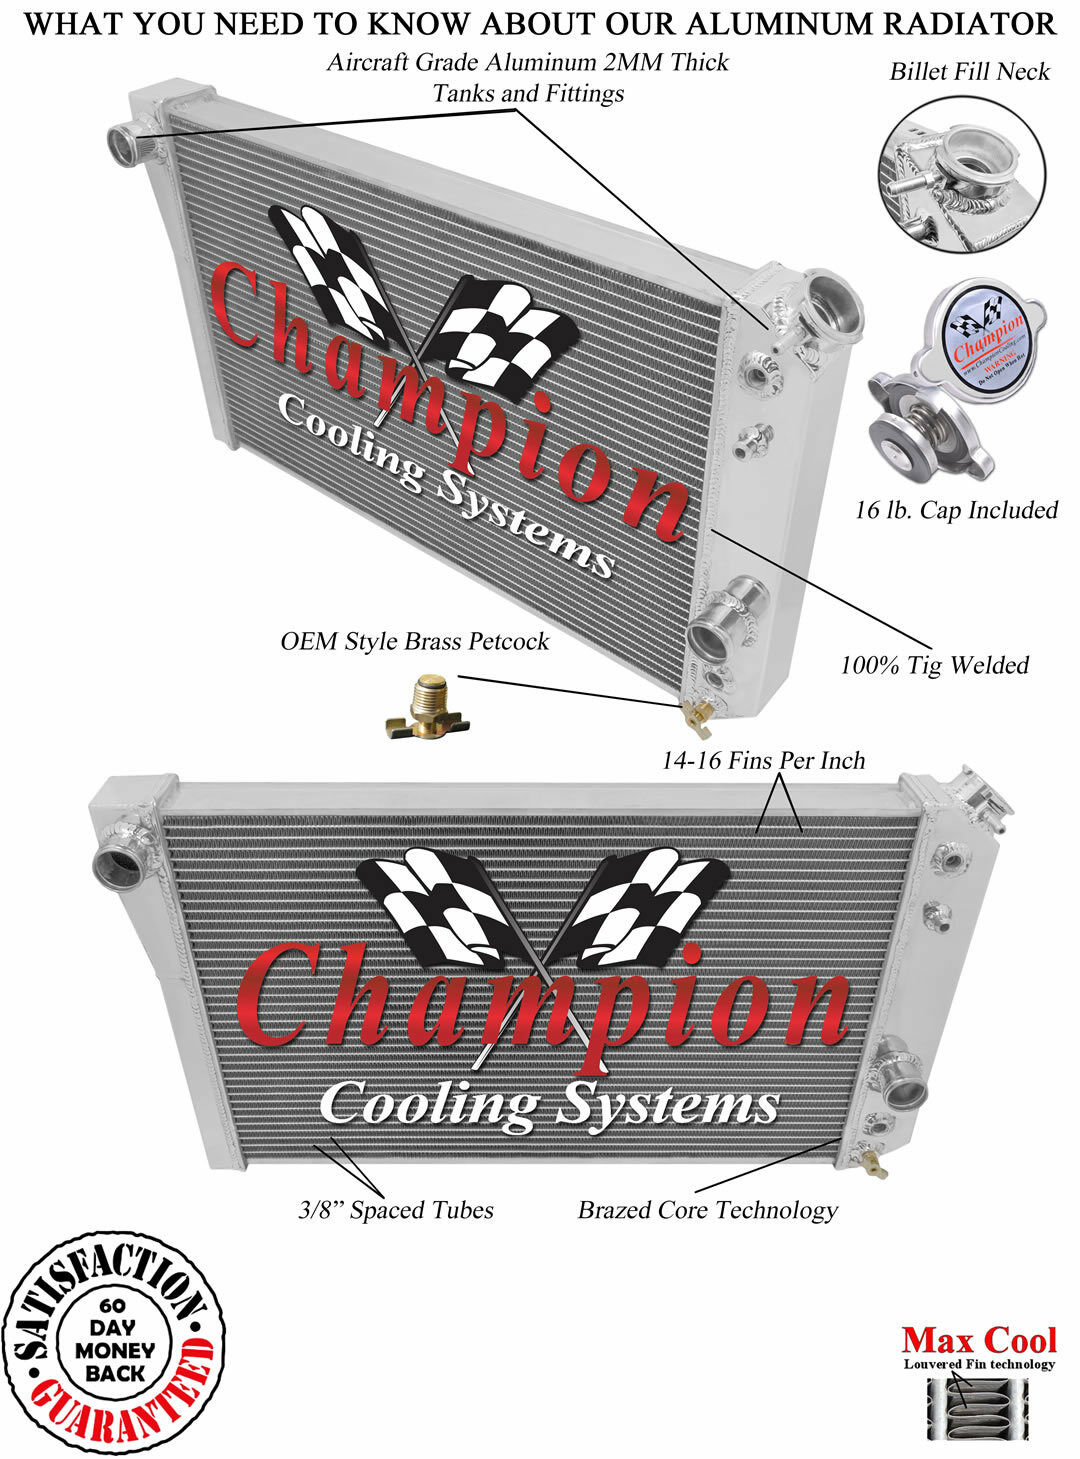 V8 Conv Champion 3 Row DR Radiator 1982 1983 1984 1985 1986-2002 Chevy S10